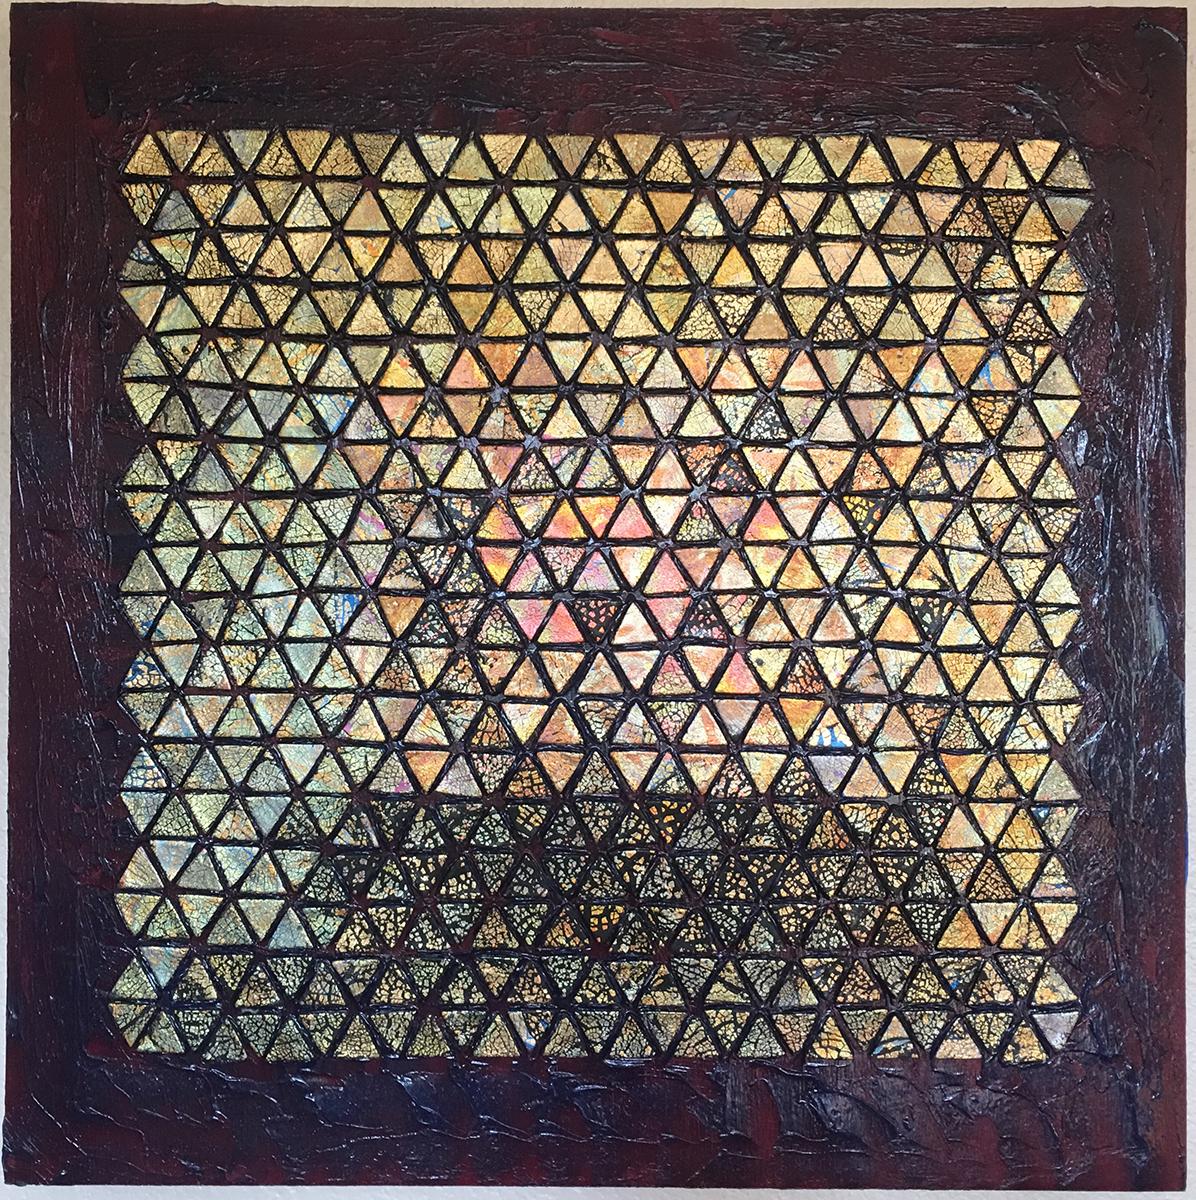 Tile Piece 2, Mixed Media, circa 1995, by Ann Stretton